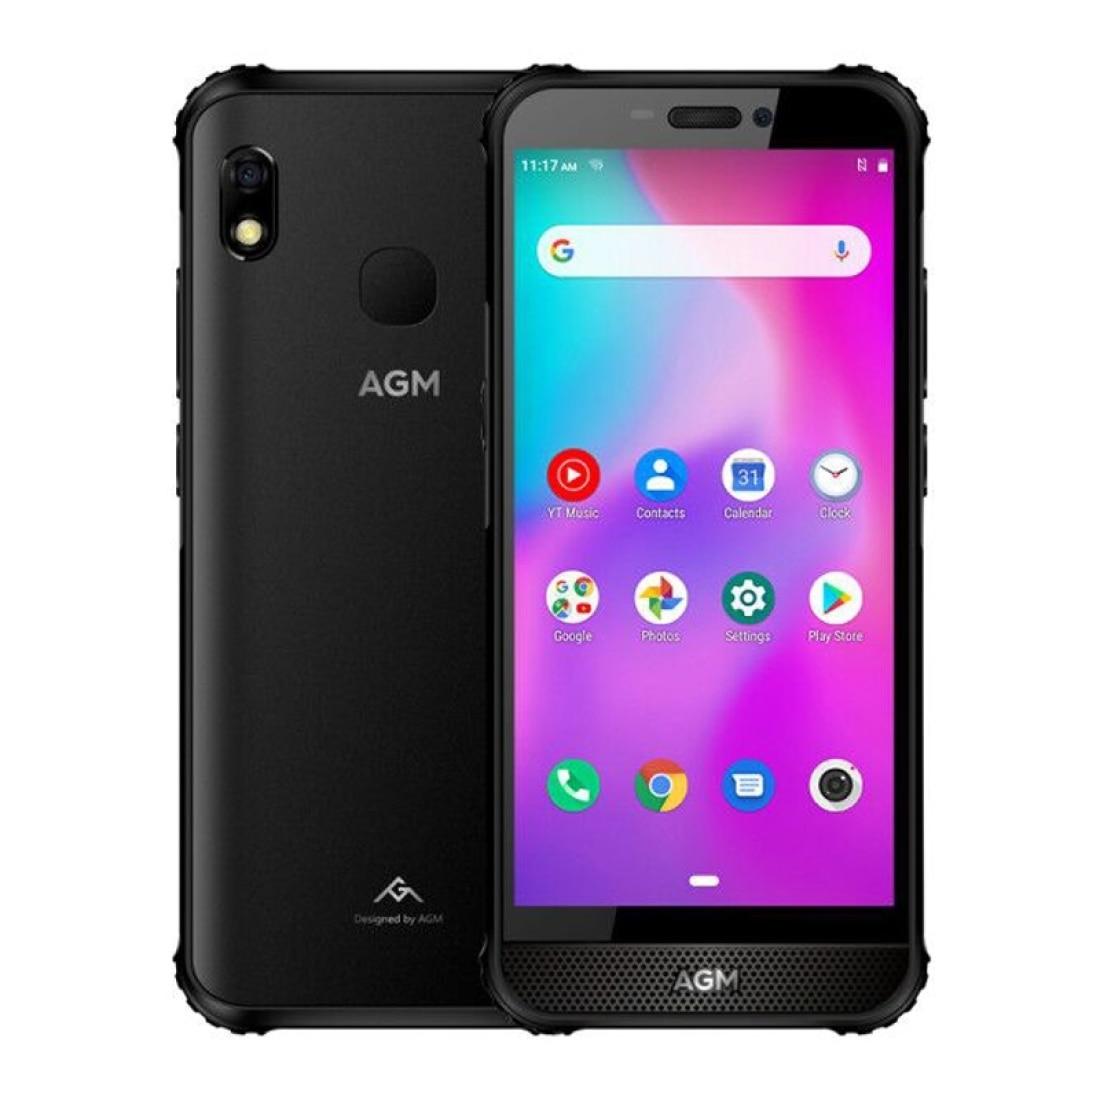 Смартфон AGM A10 защищенный, 4 + 64 ГБ, Android 9, 5,7 дюйма, NFC, 13 МП, 4400 мАч